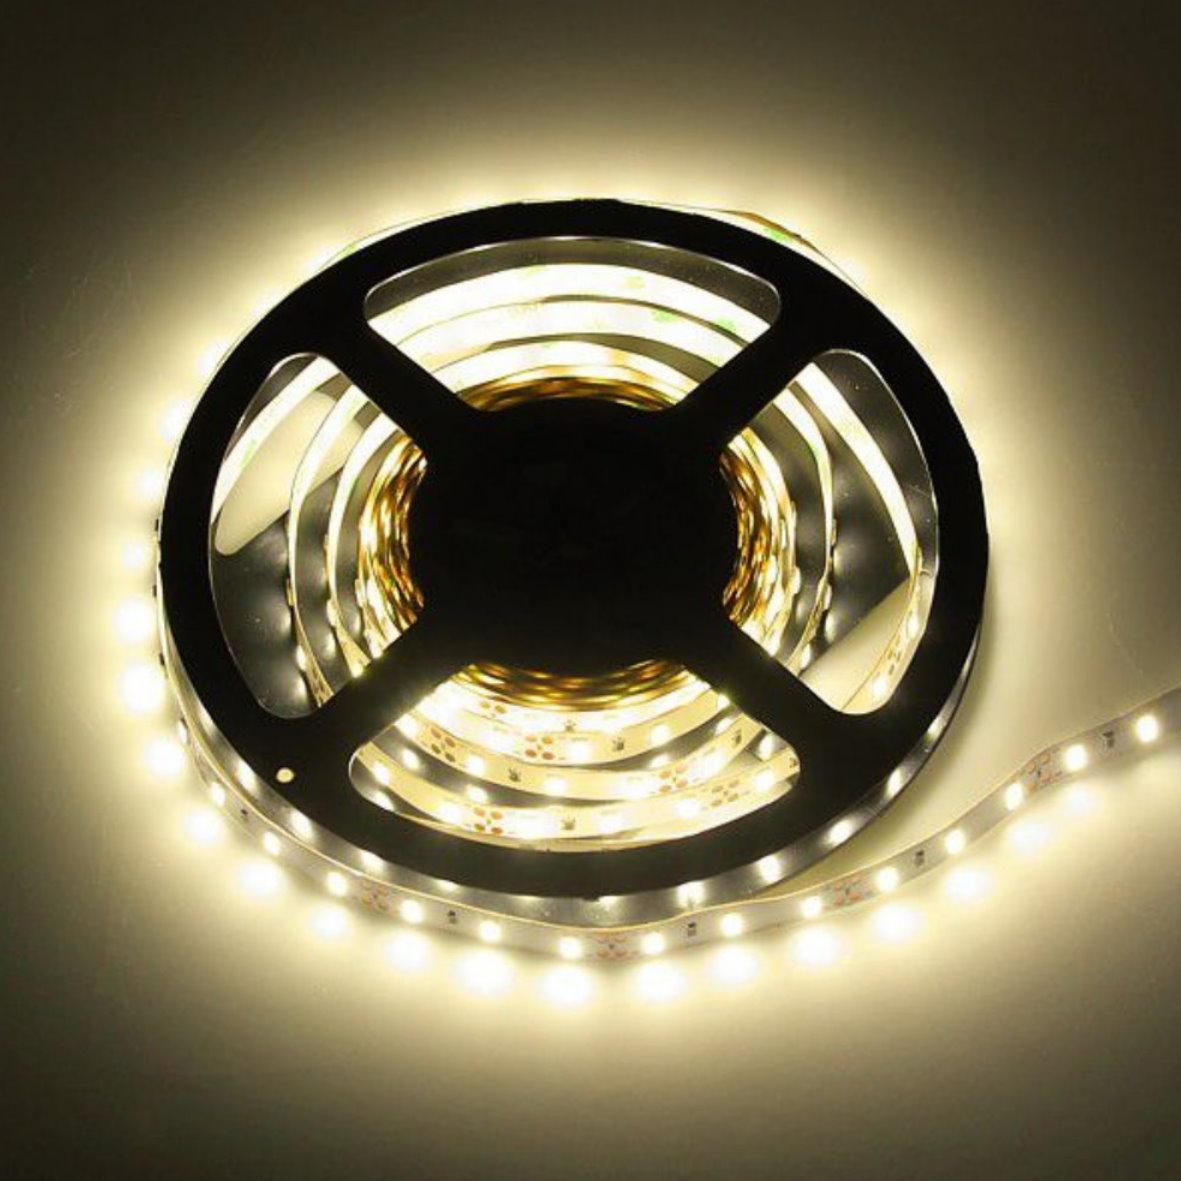 5 98 eur m led stripe 5m dimmbar 30w 2500lm 300 x 3528 smd lichtband rolle ebay. Black Bedroom Furniture Sets. Home Design Ideas